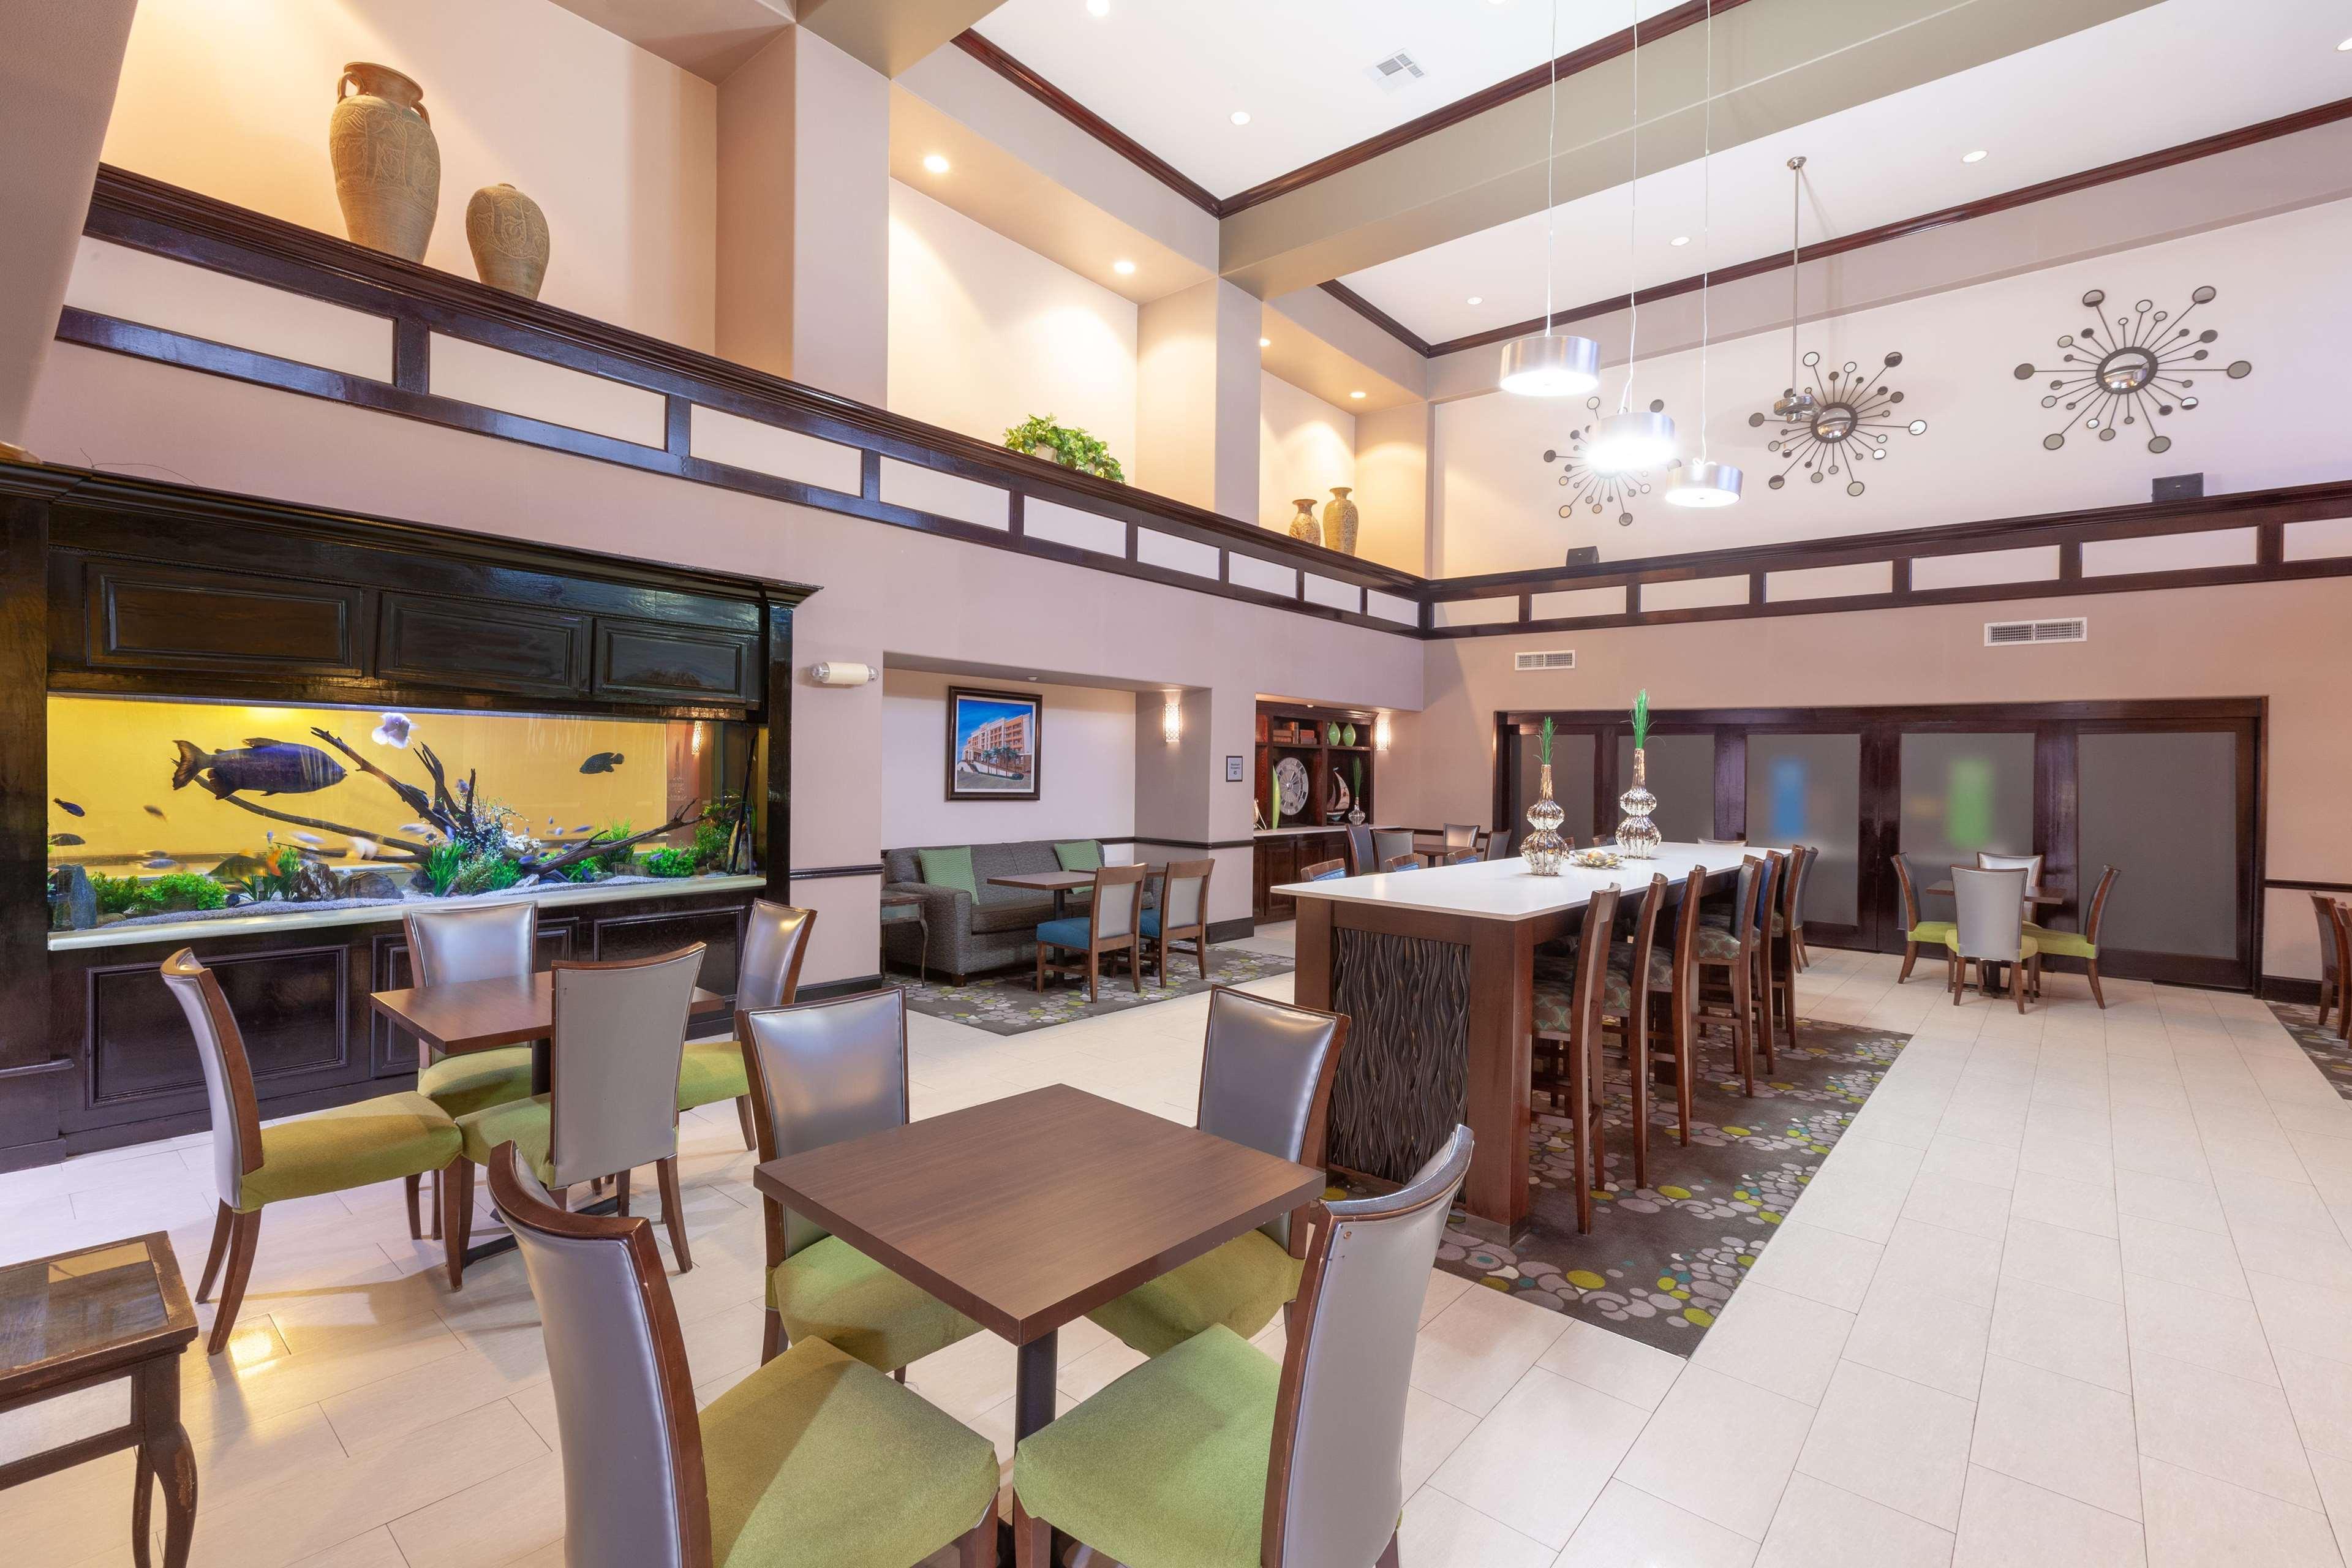 Hampton Inn & Suites Galveston image 13